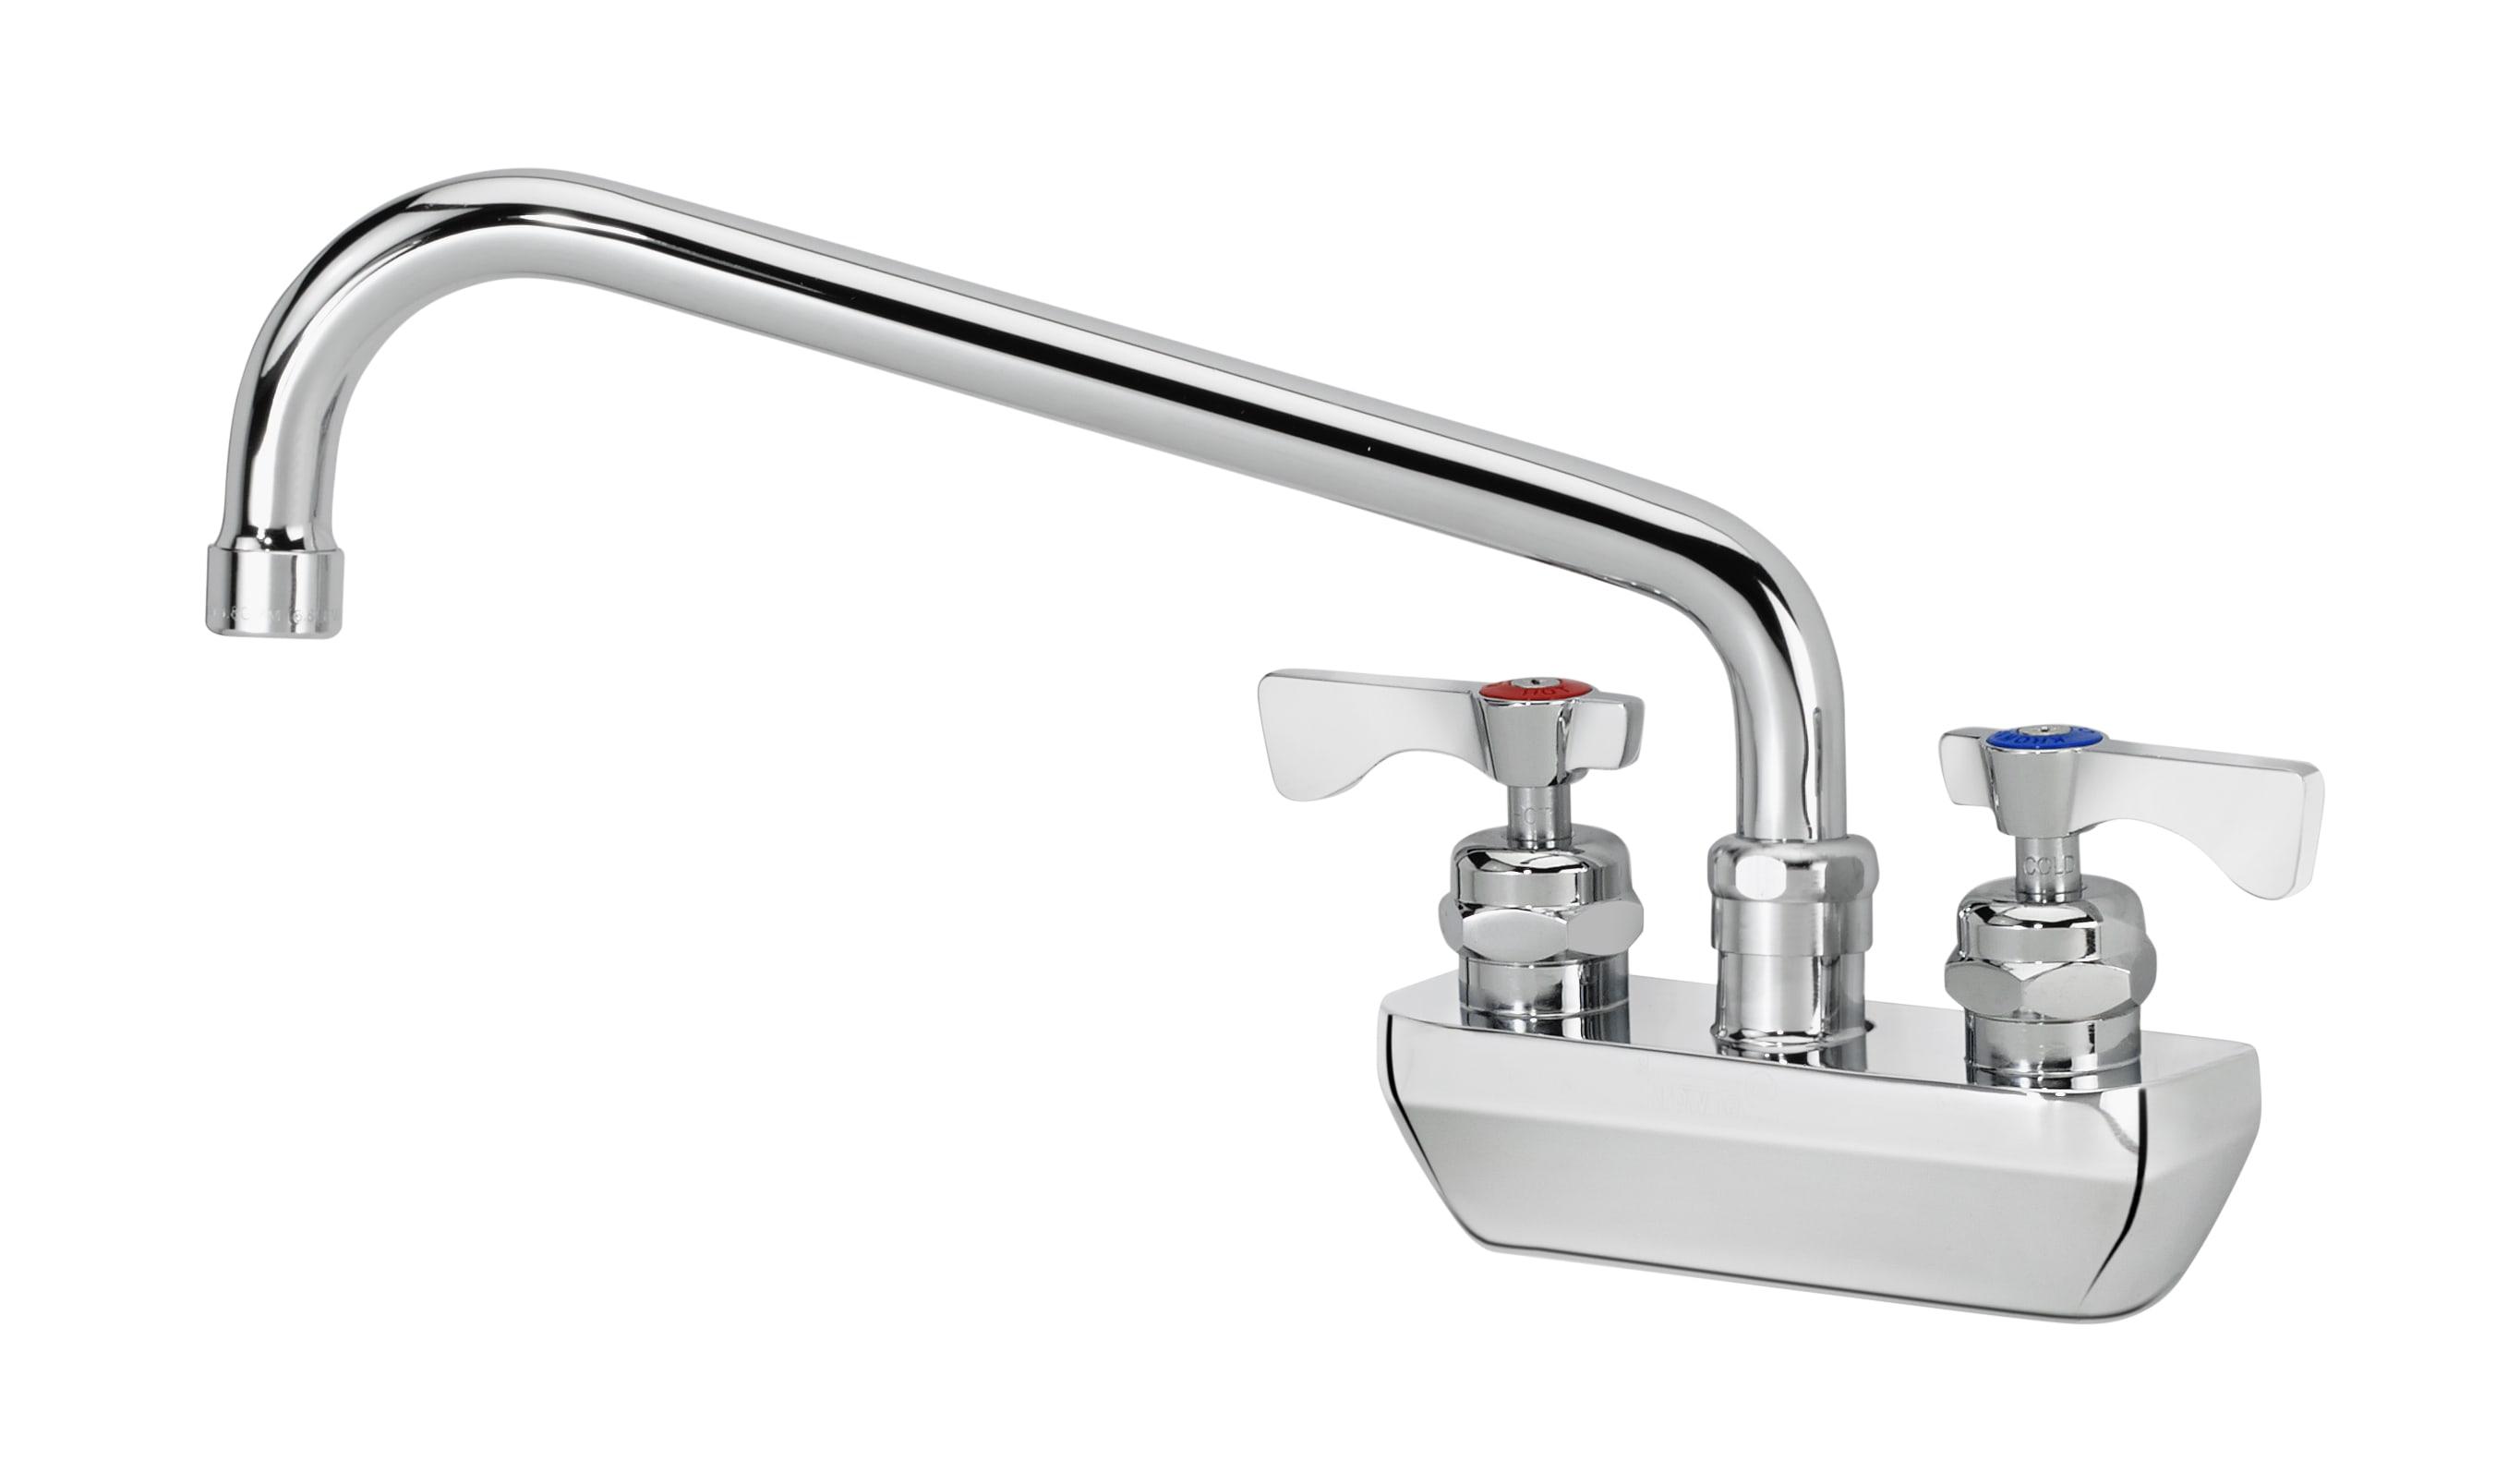 "Krowne 14-410L Low Lead Royal Series Faucet, Splash Mount, 10"" Long"